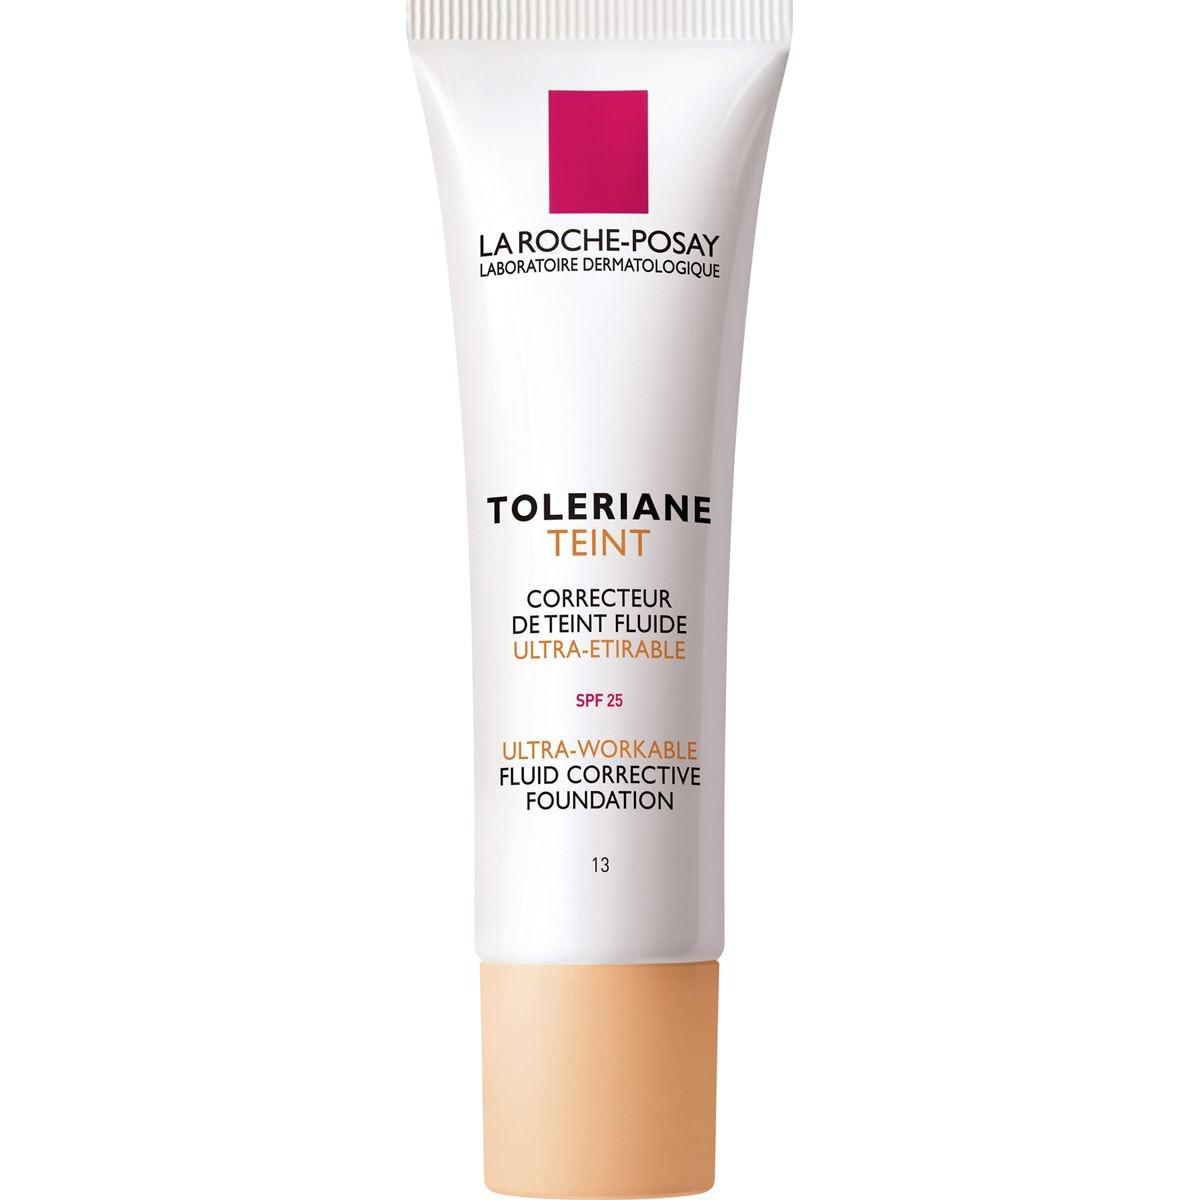 Maquillaje lrp toleriane teint #13  - Sanborns